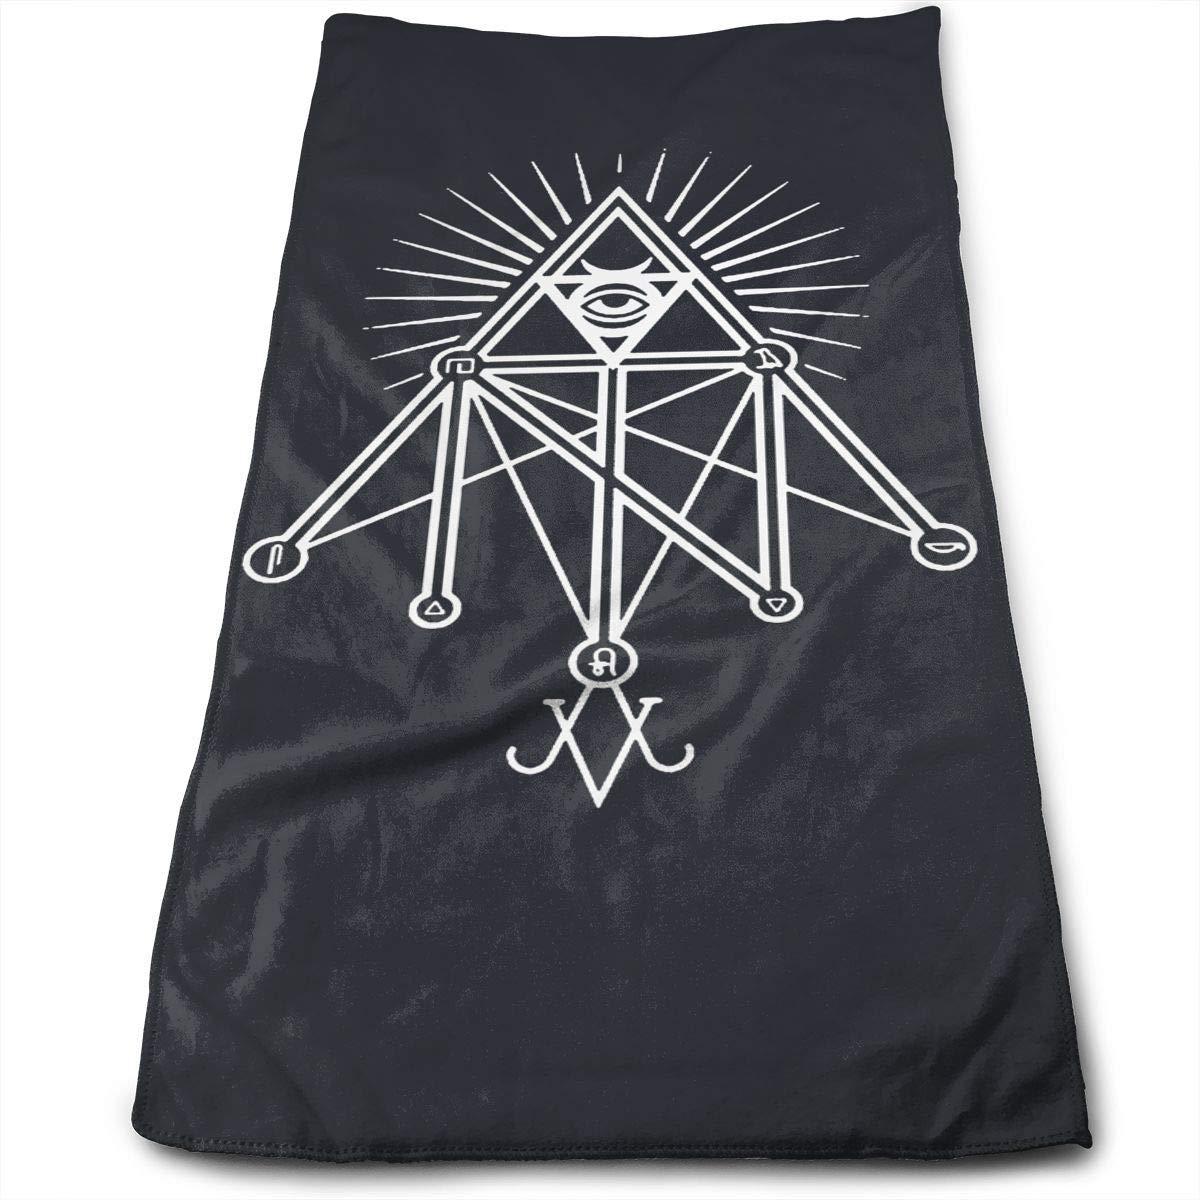 WCMBY Illuminati Occult Geometric Satanic Towel